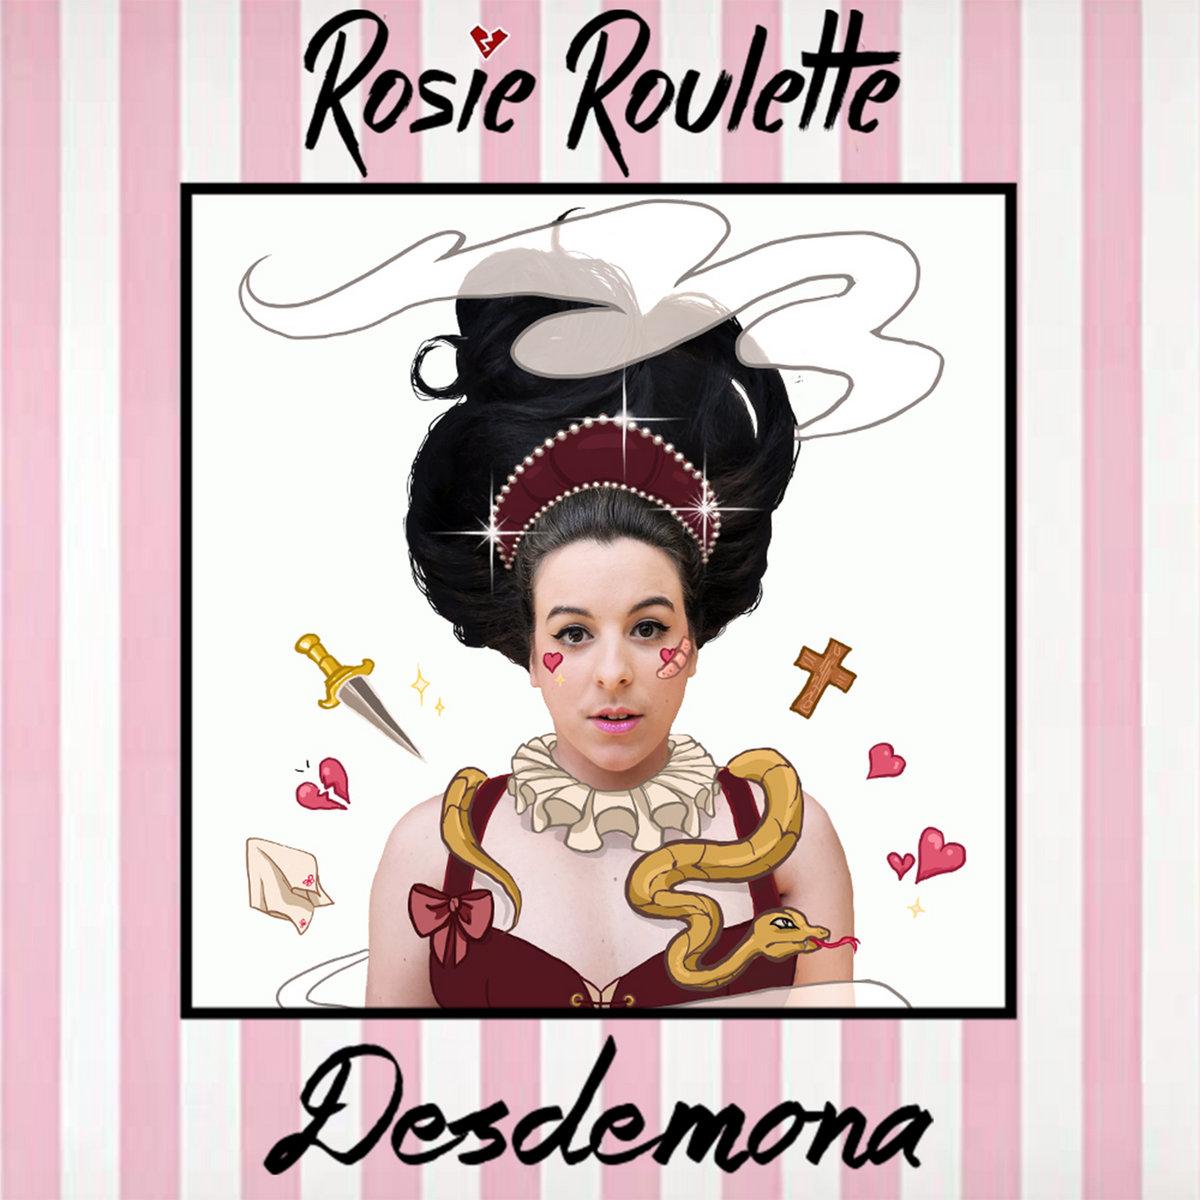 Desdemona by Rosie Roulette